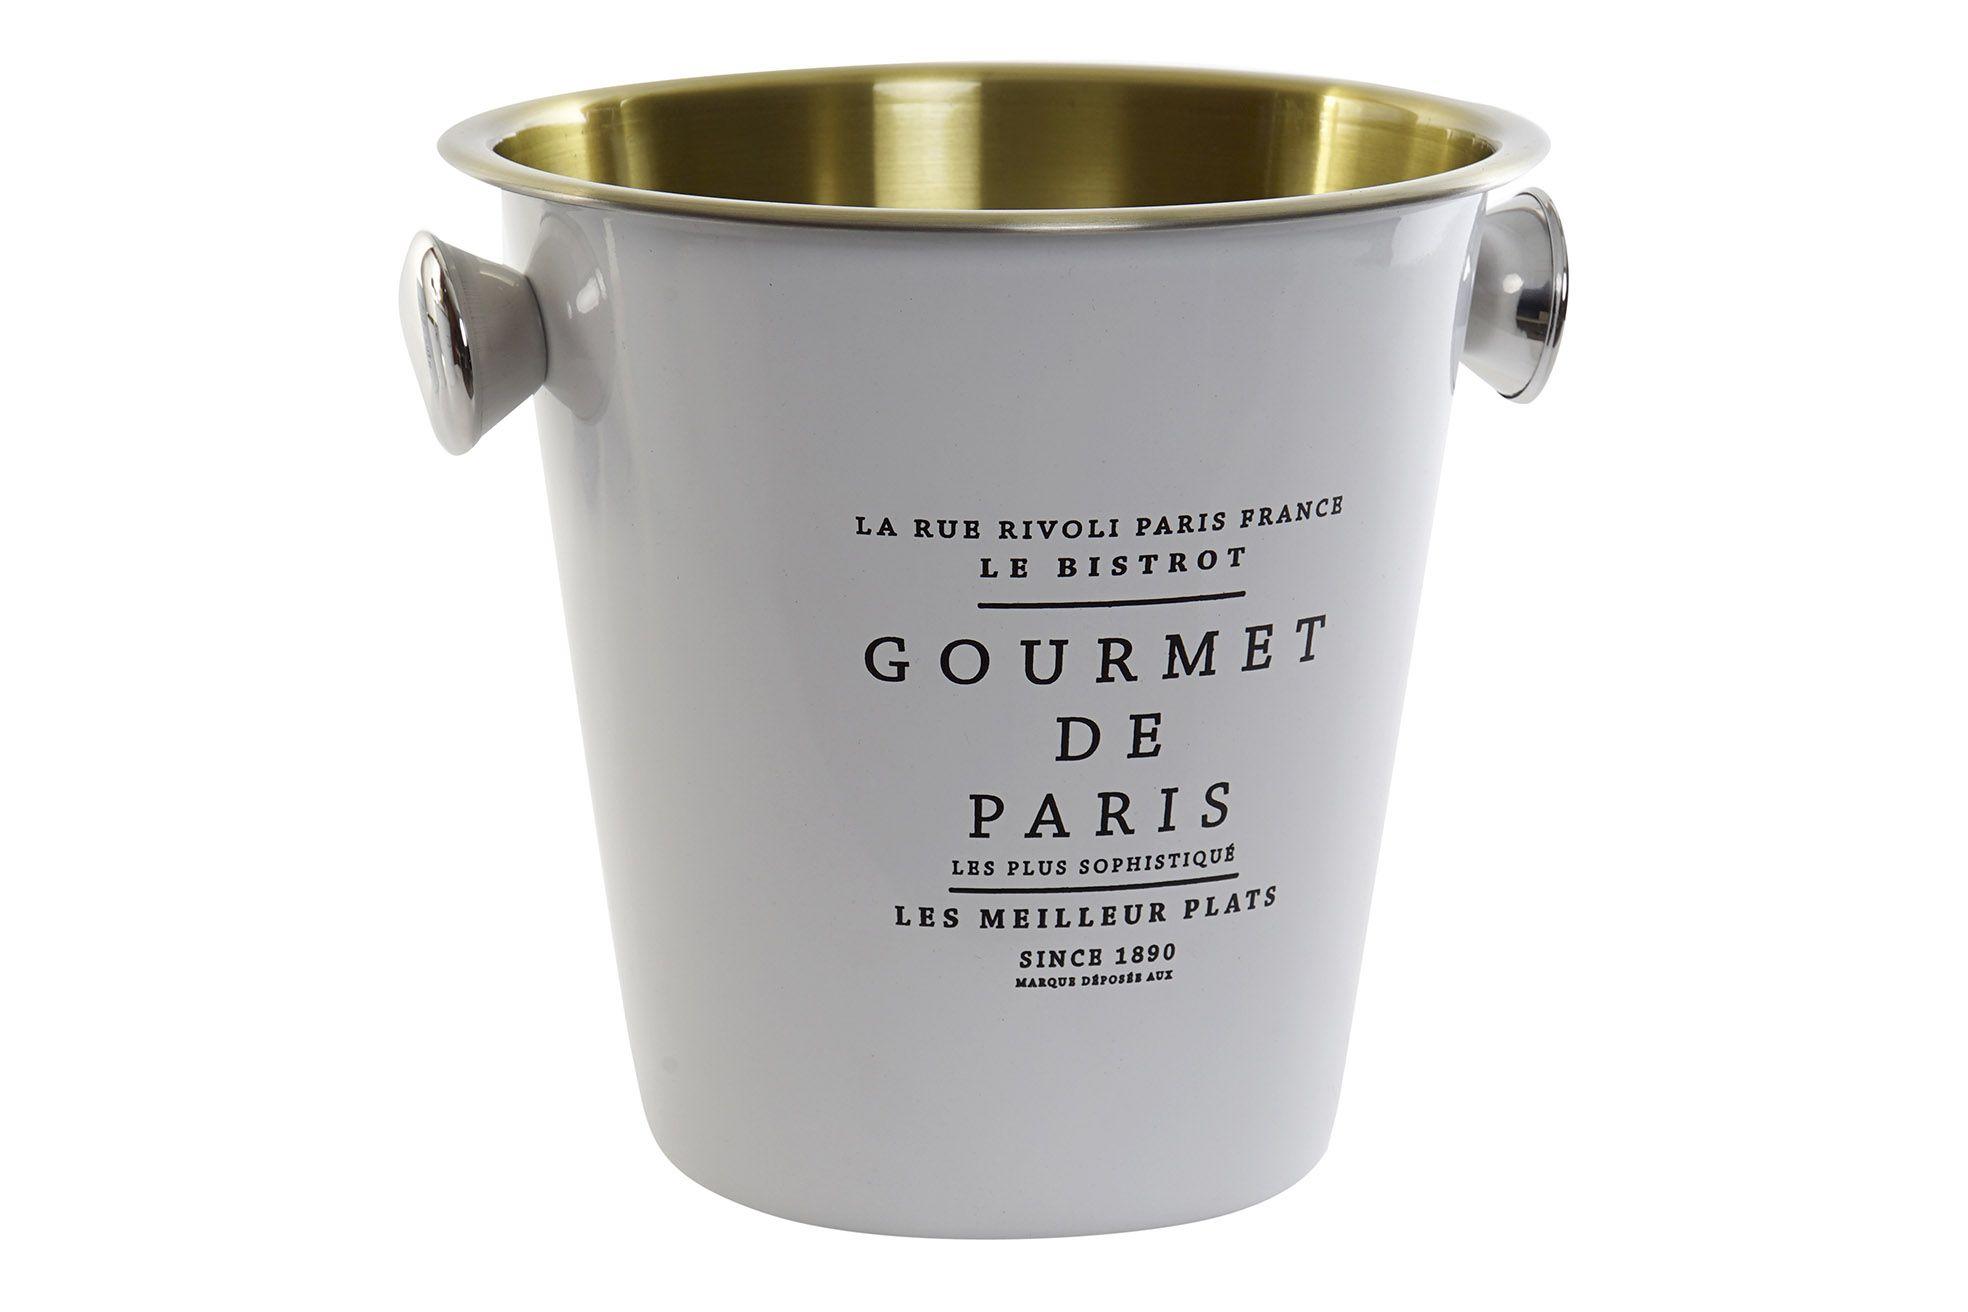 Porta champagne acciaio oro bianco art PC-159723 22x24x22h €19,90